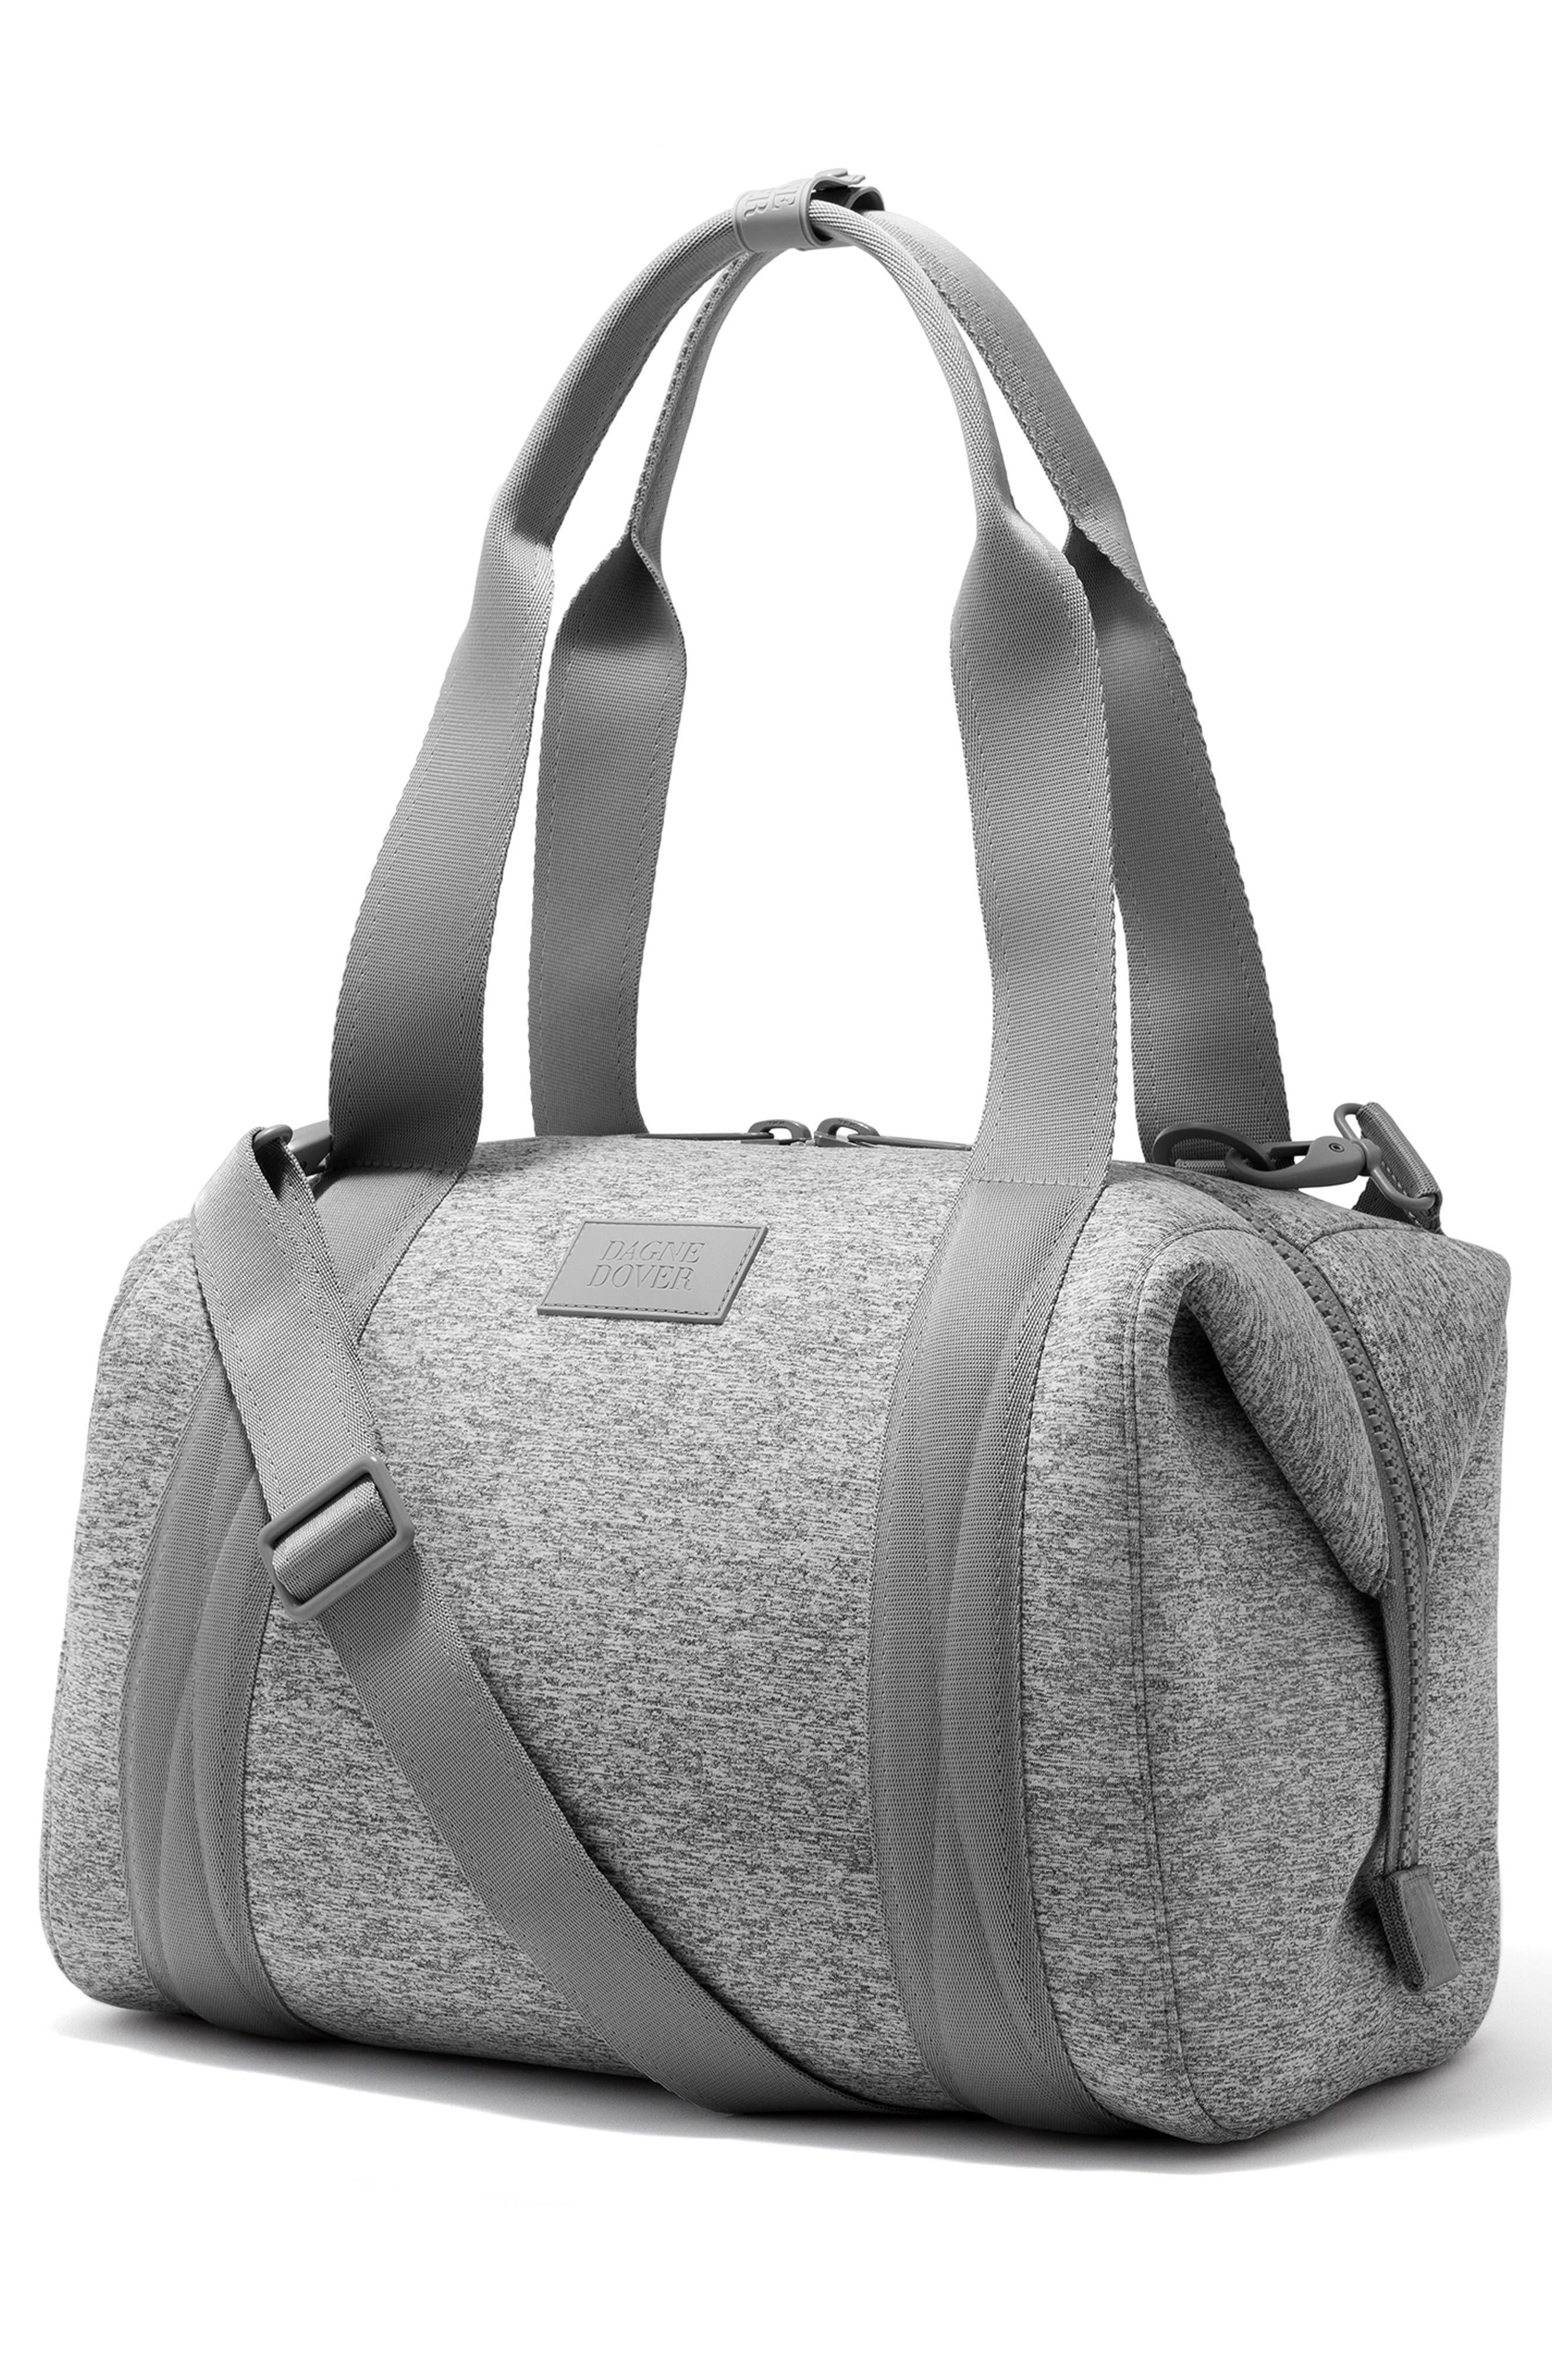 365 Medium Landon Neoprene Carryall Duffel Bag,                             Alternate thumbnail 5, color,                             HEATHER GREY